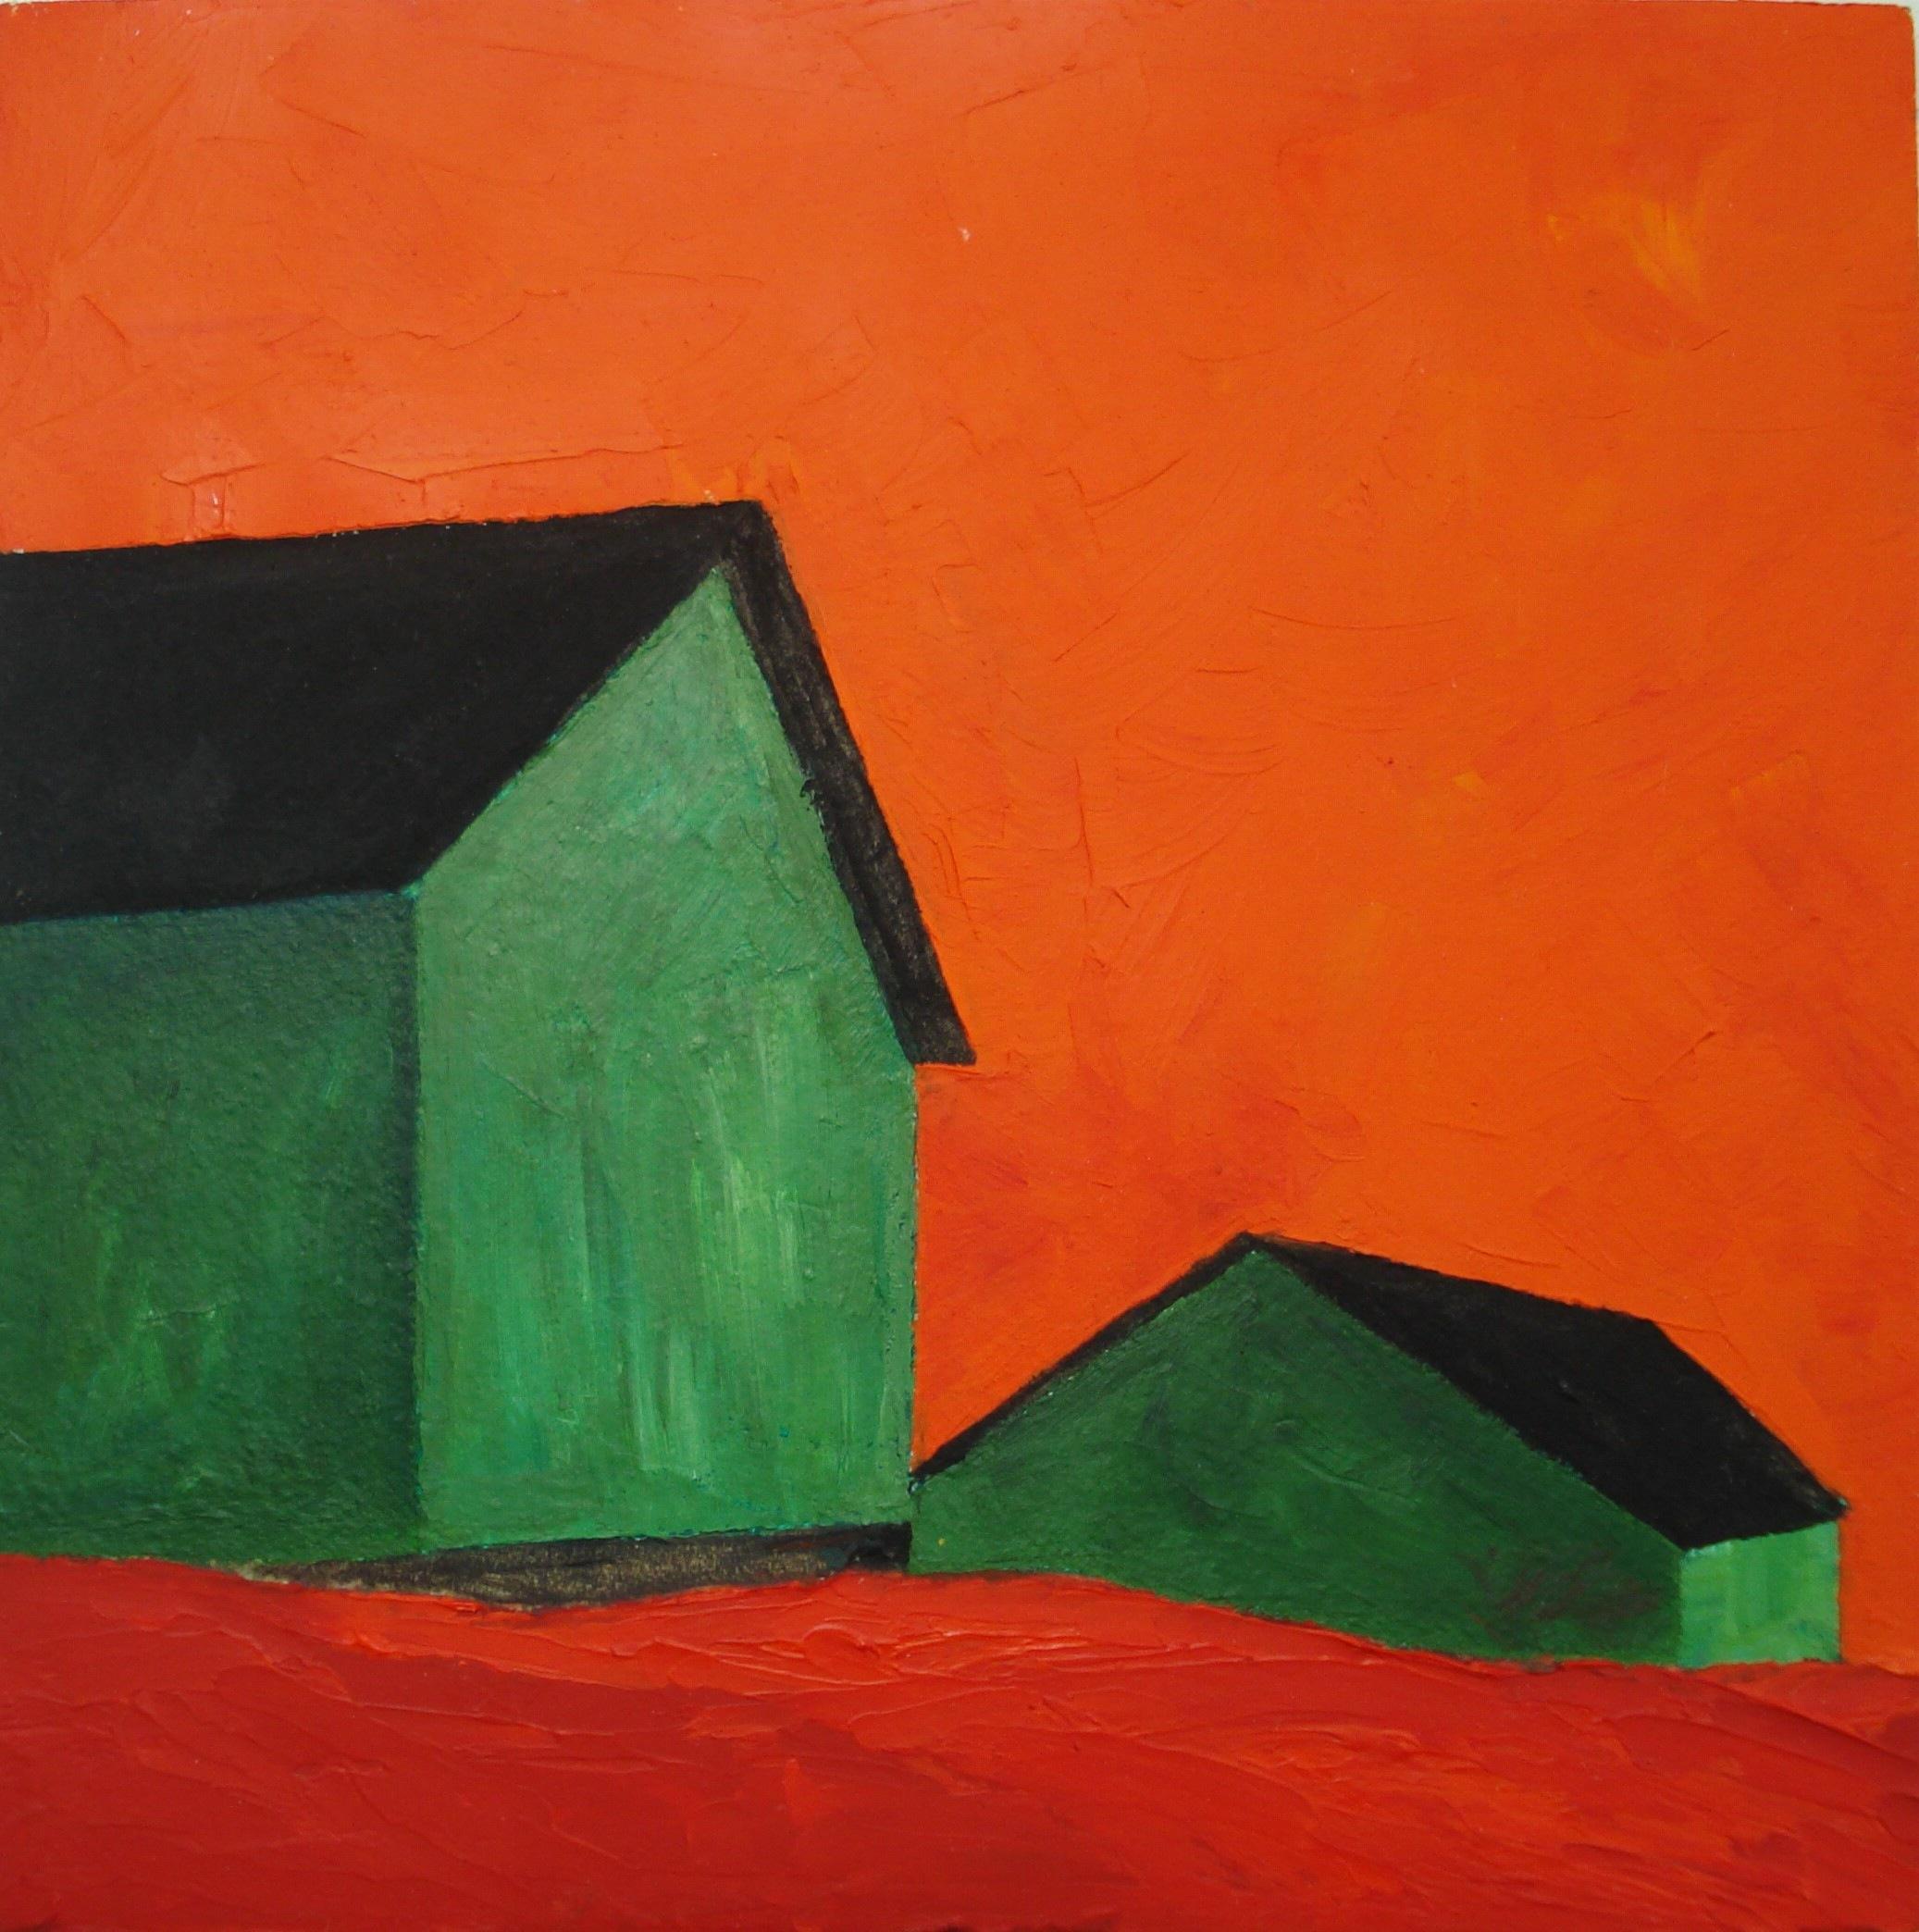 Green Barns